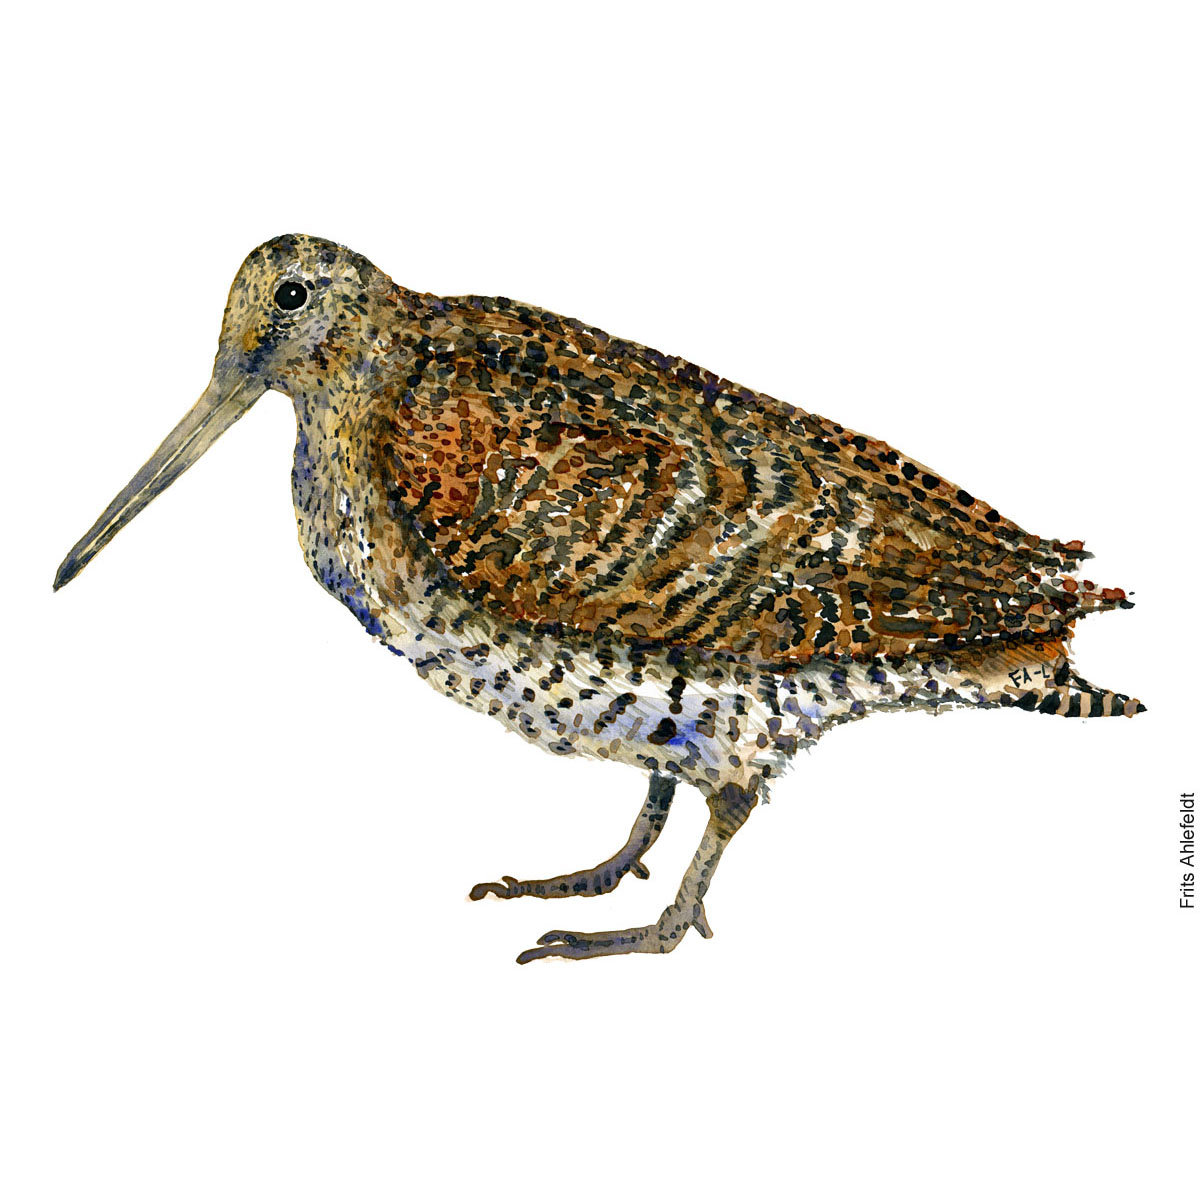 Woodcock Bird watercolour illustration handmade by Frits Ahlefeldt